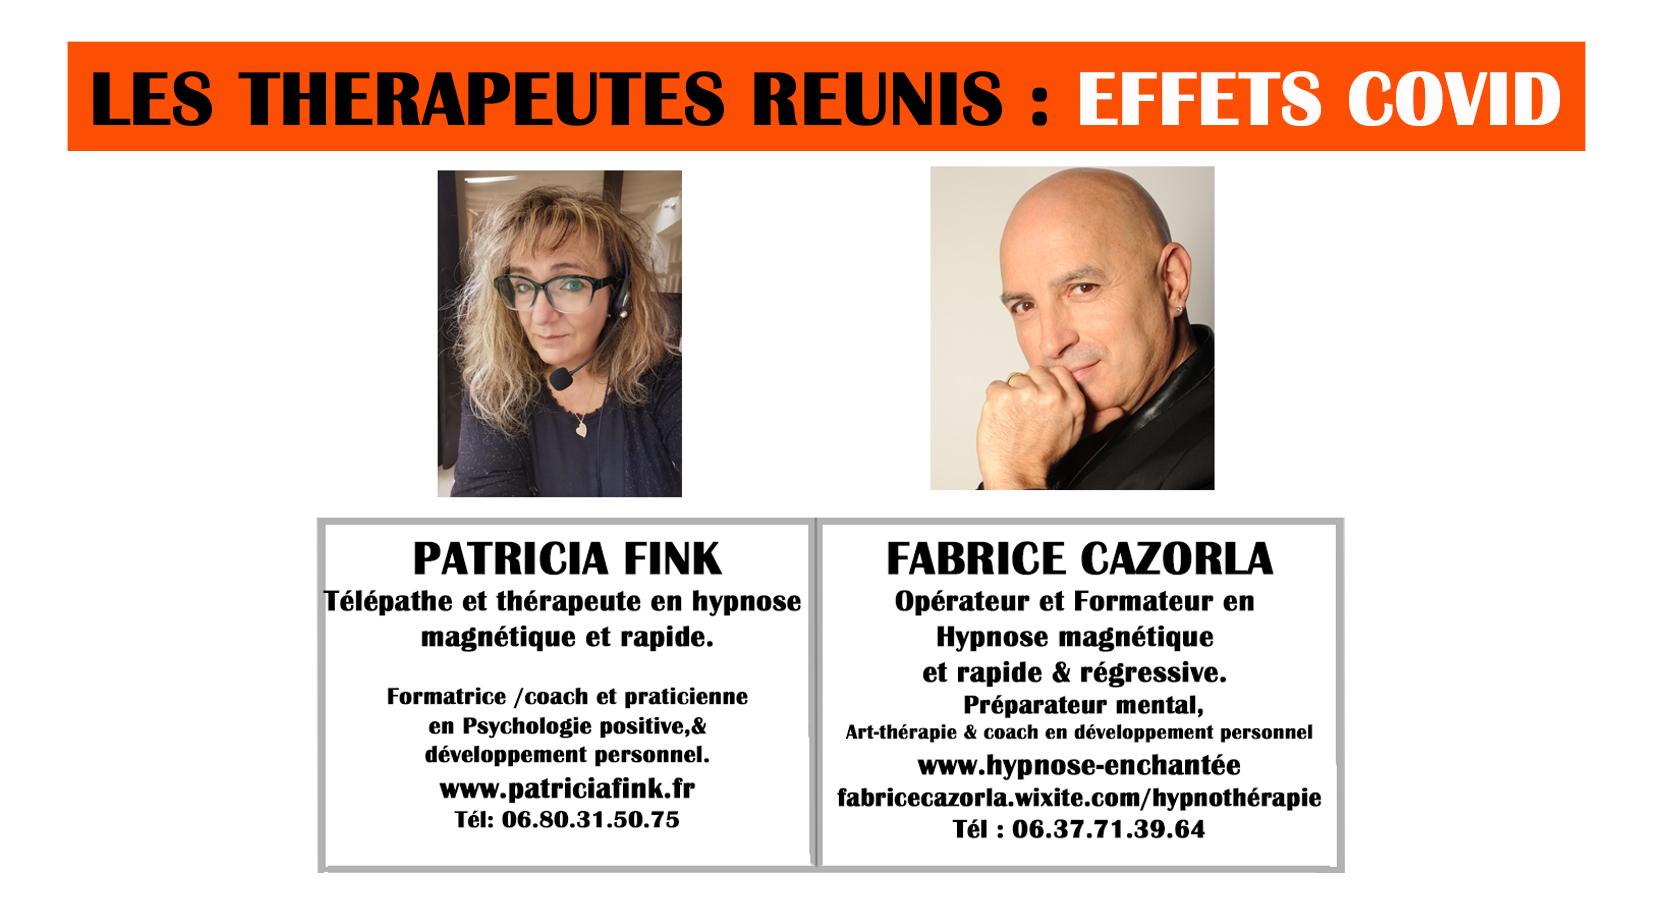 les-therapeutes-reunis-effets-covid-OK-1--Copie